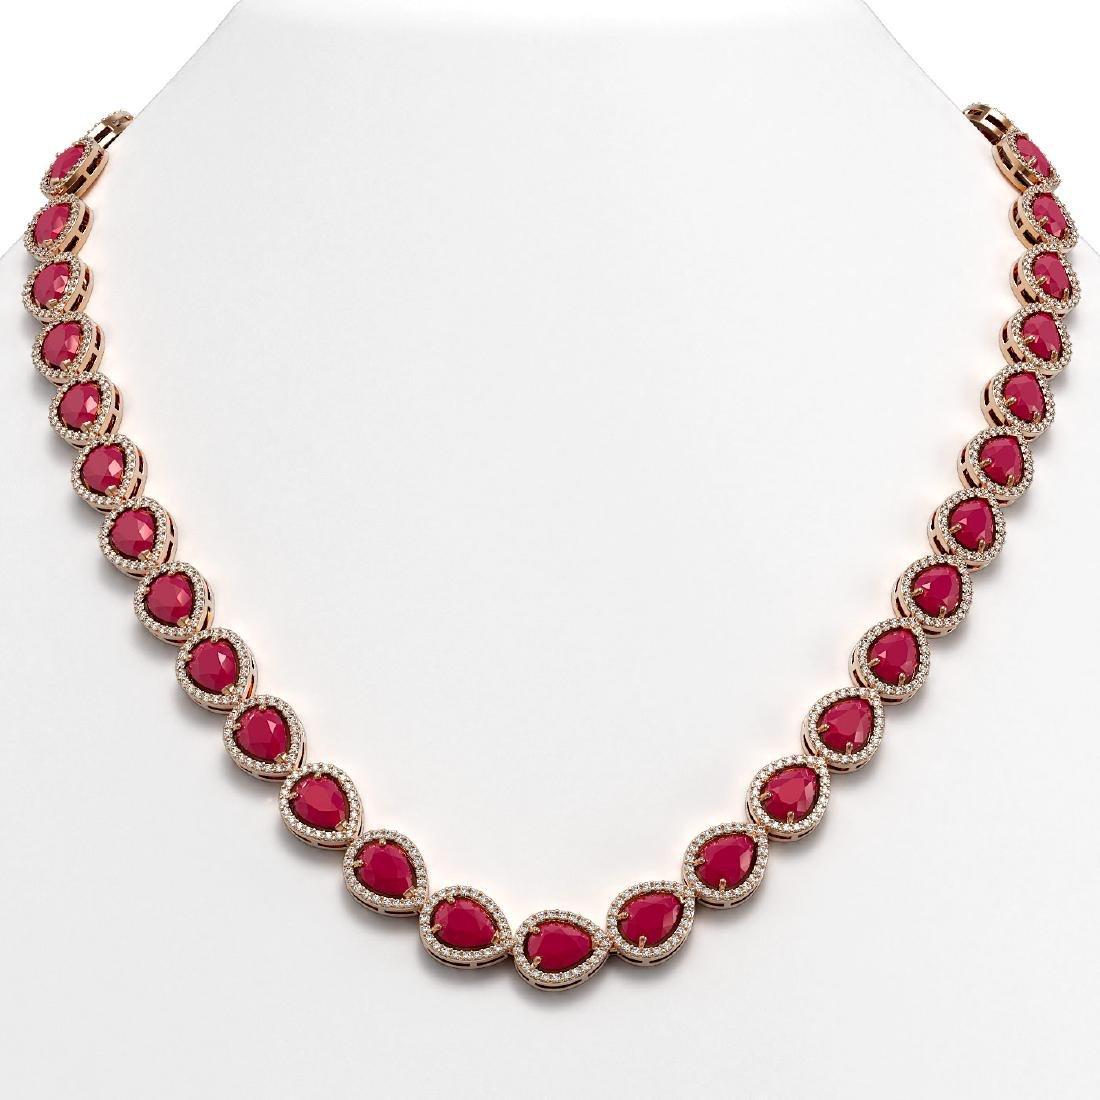 45.93 CTW Ruby & Diamond Halo Necklace 10K Rose Gold